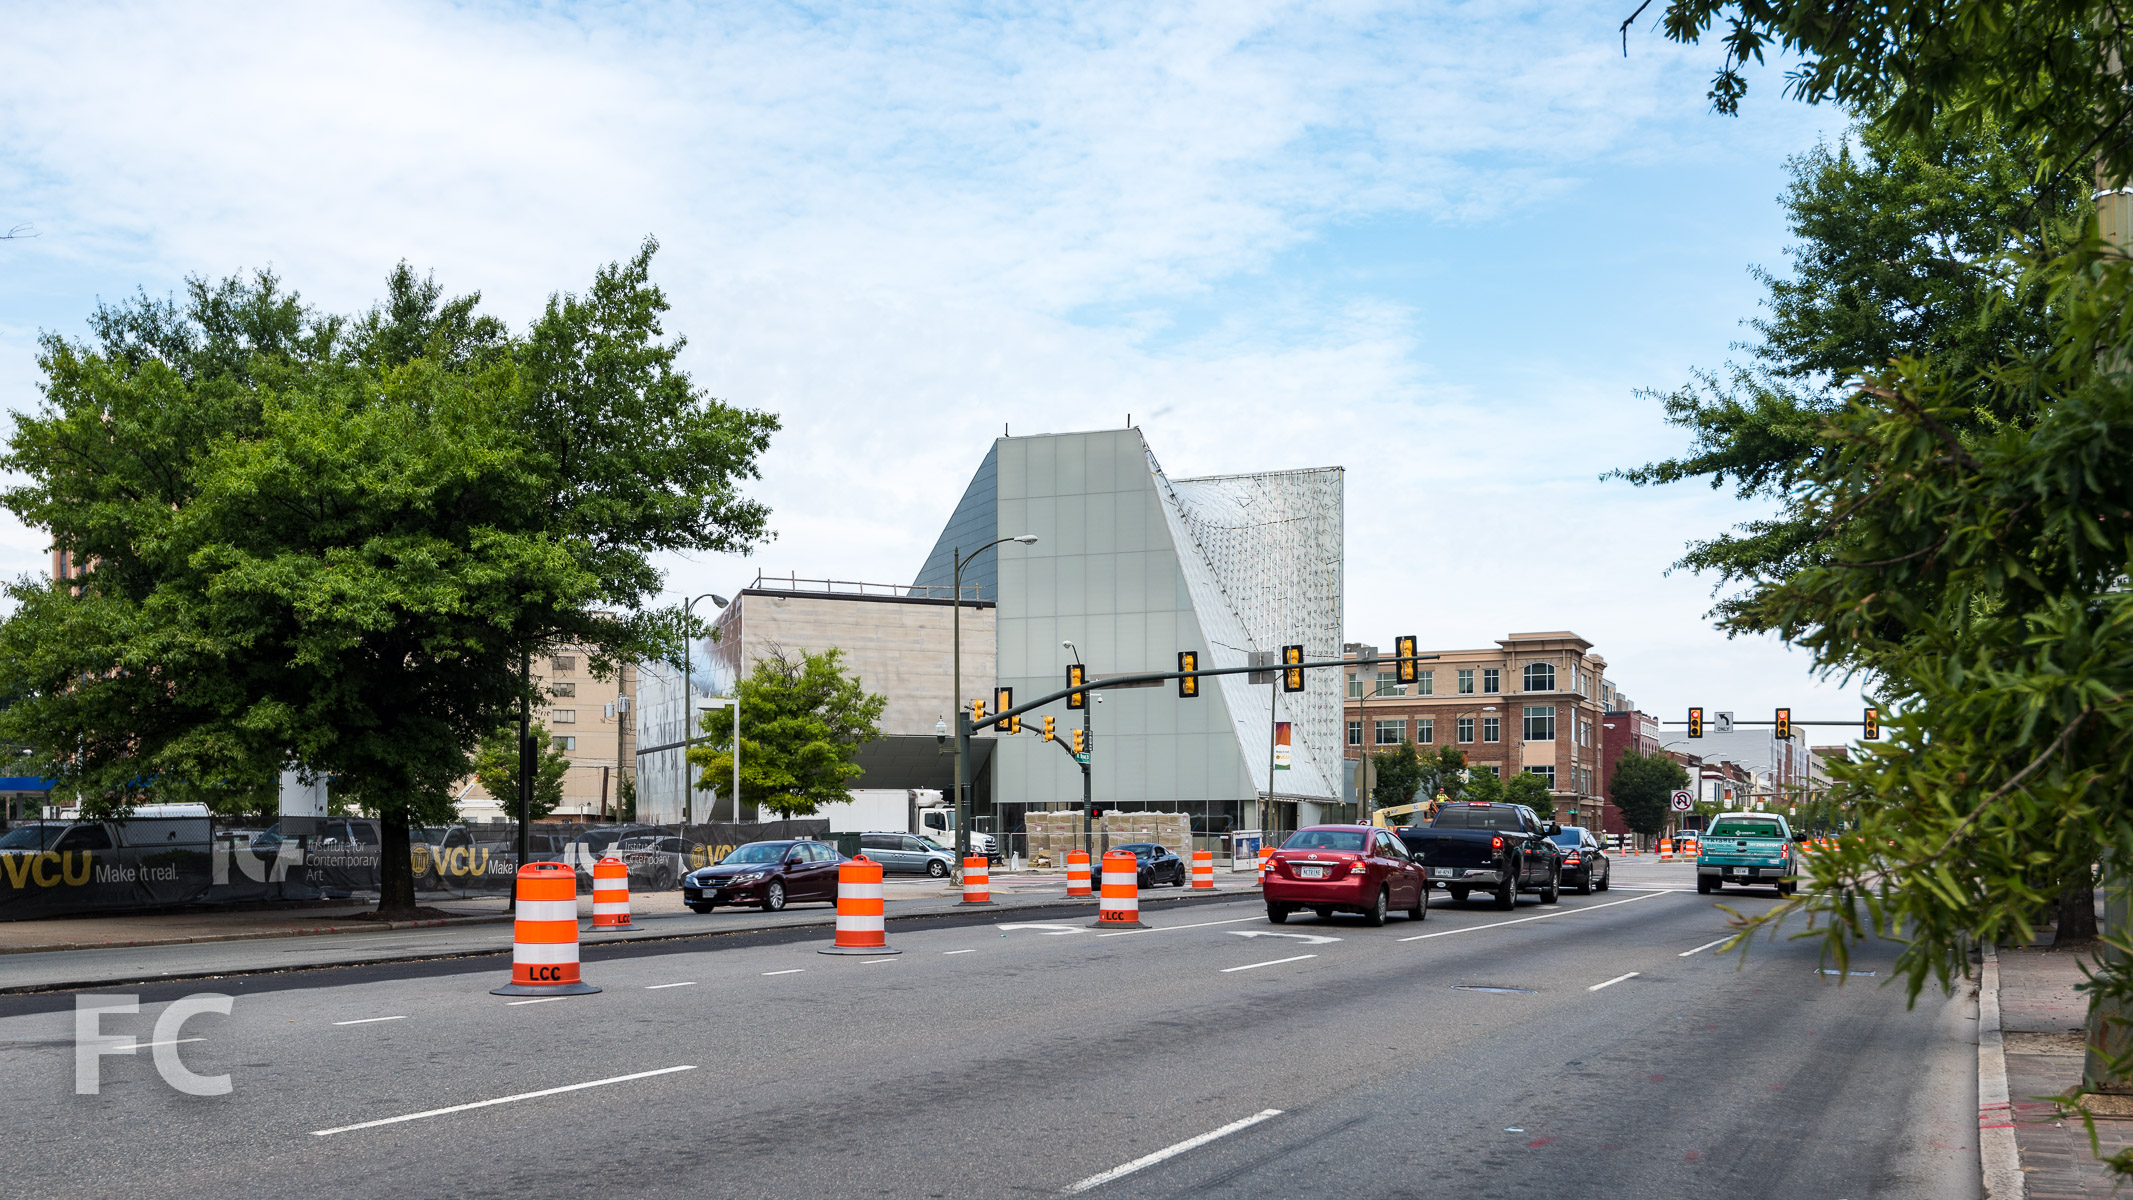 Southeast corner from West Broad Street.